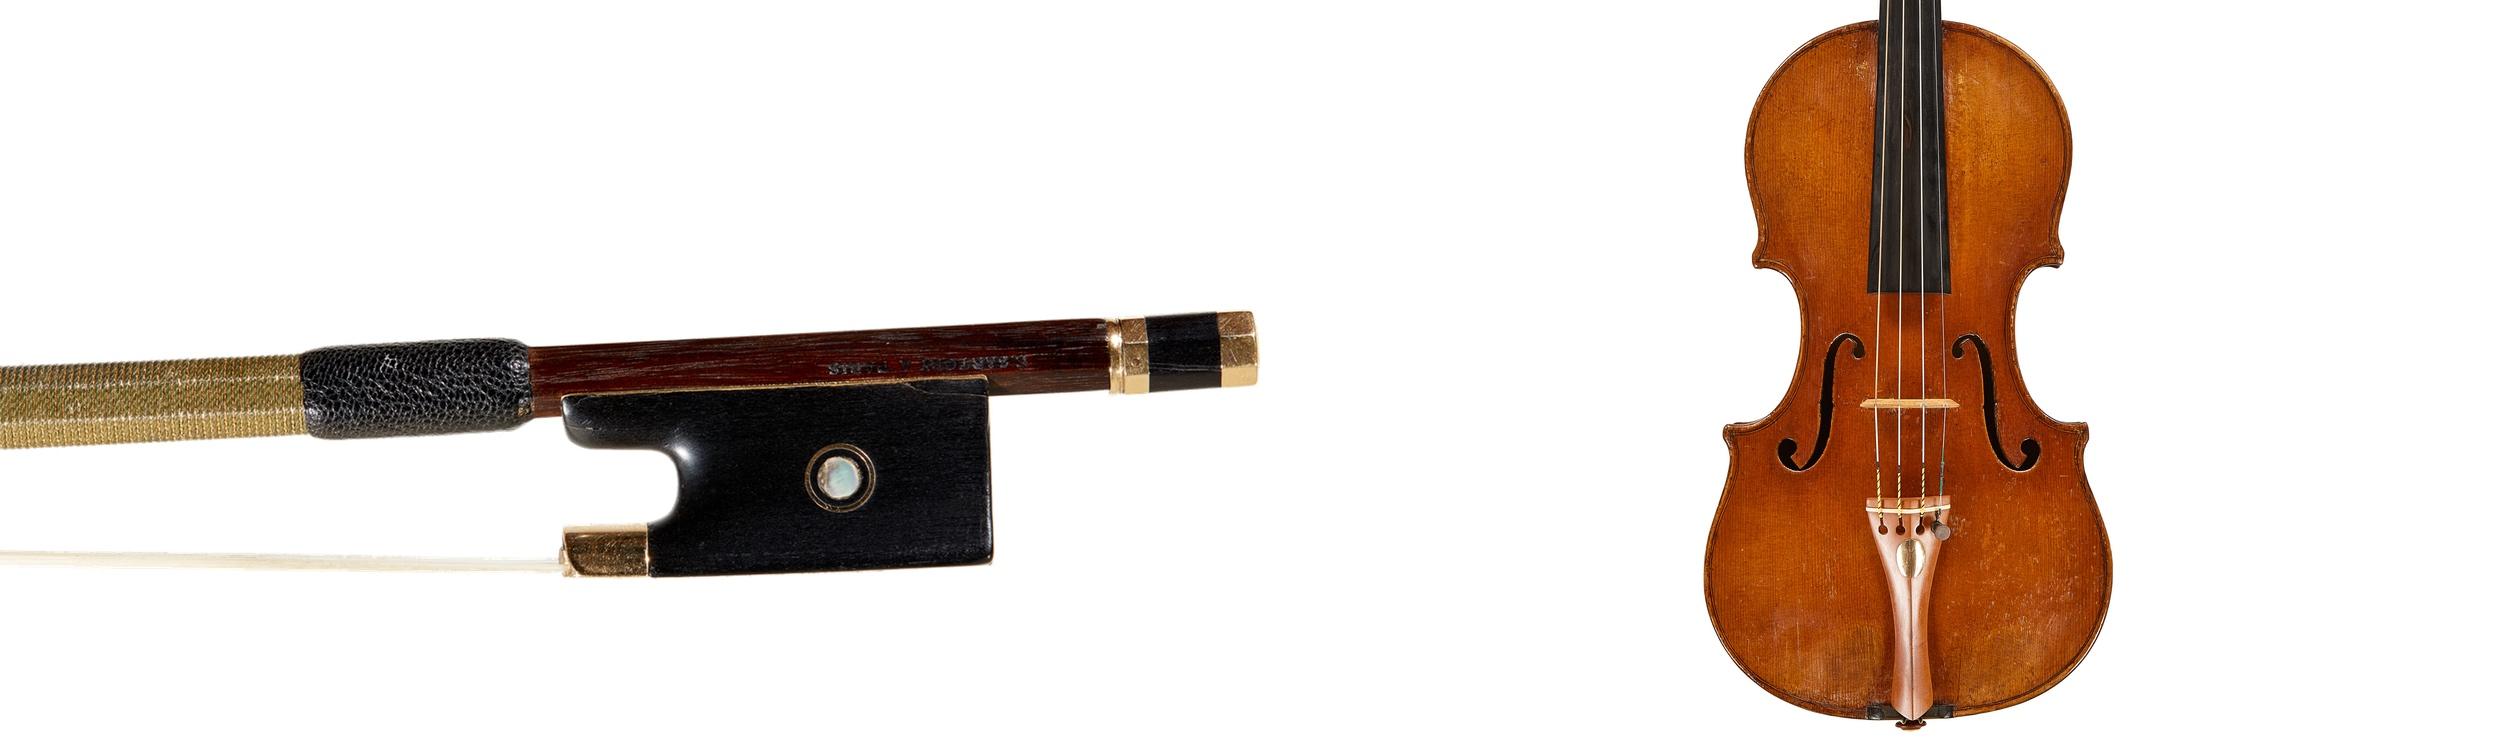 Tarisio - Fine Instruments & Bows